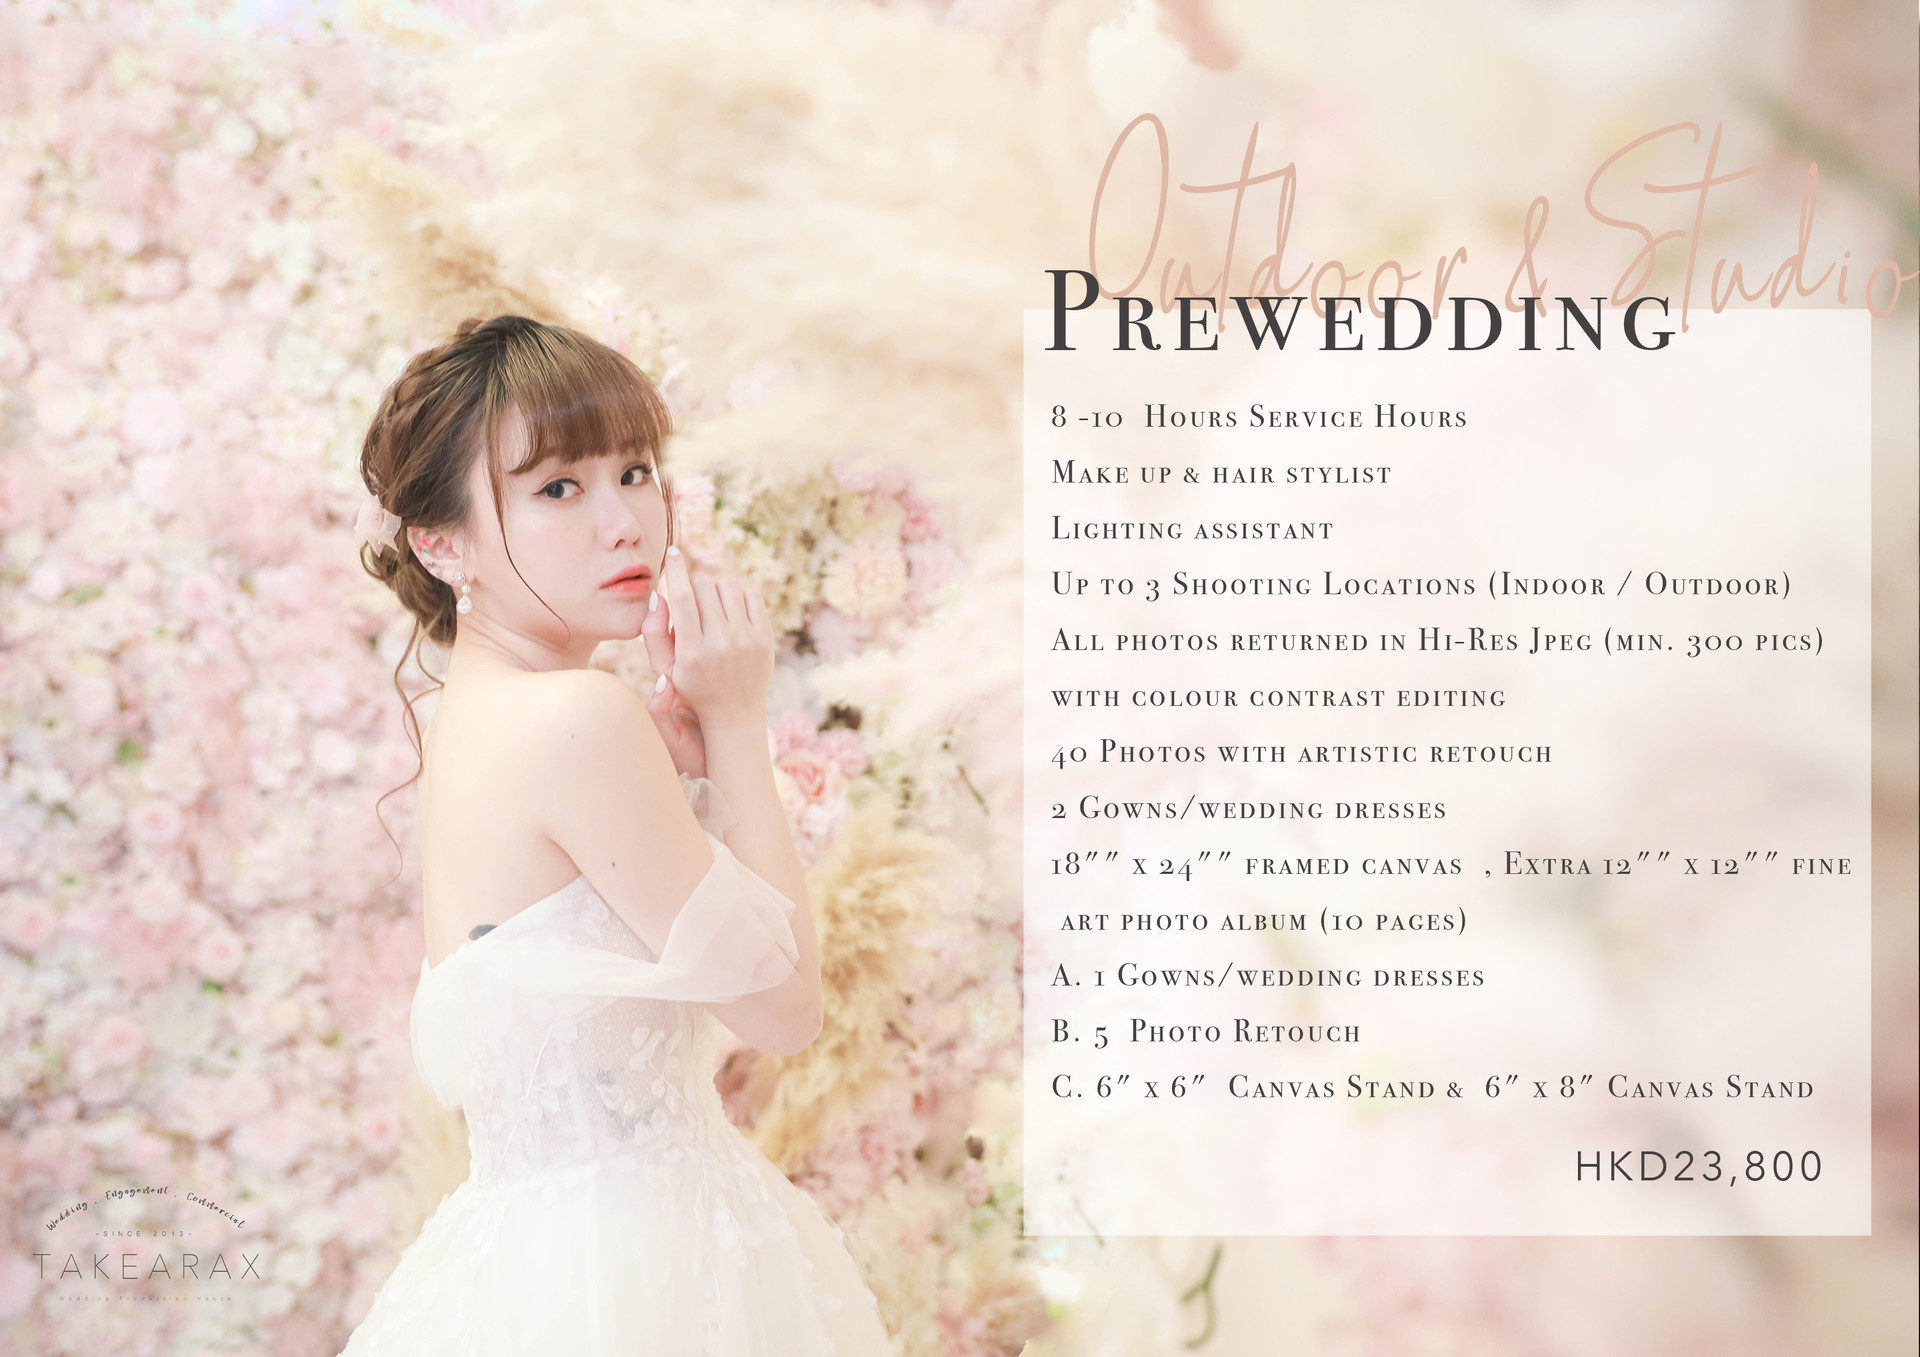 Prewedding (Studio23800) 2 .jpg